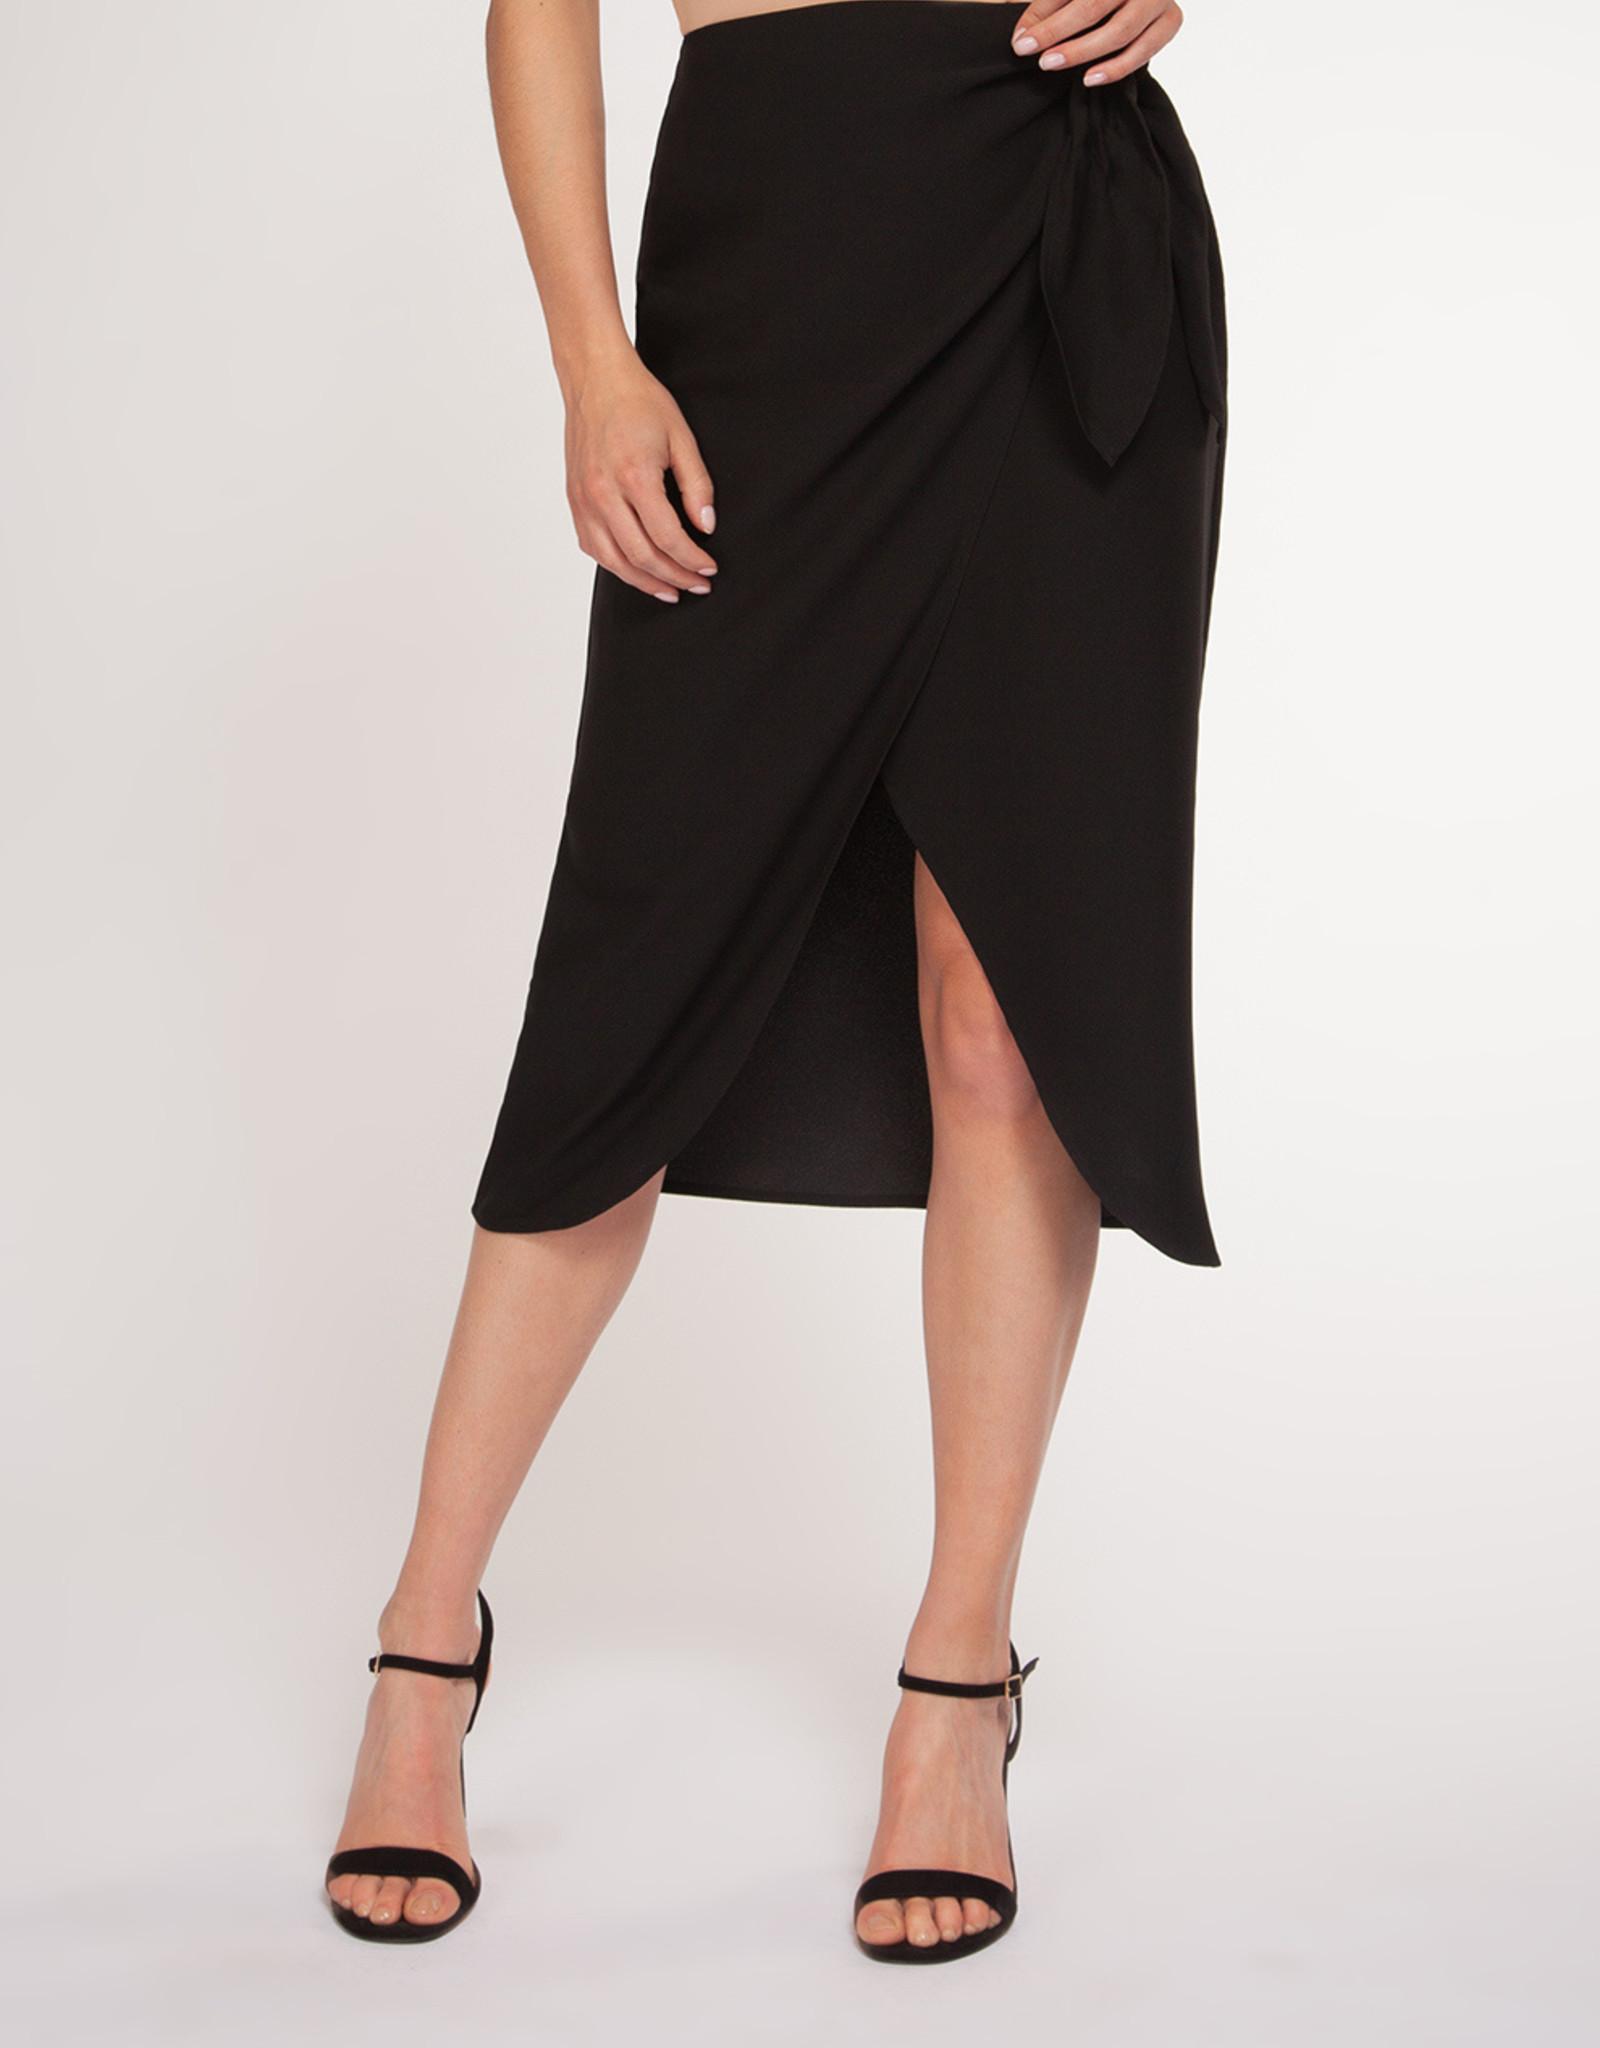 Black Tape Faux Wrap Skirt